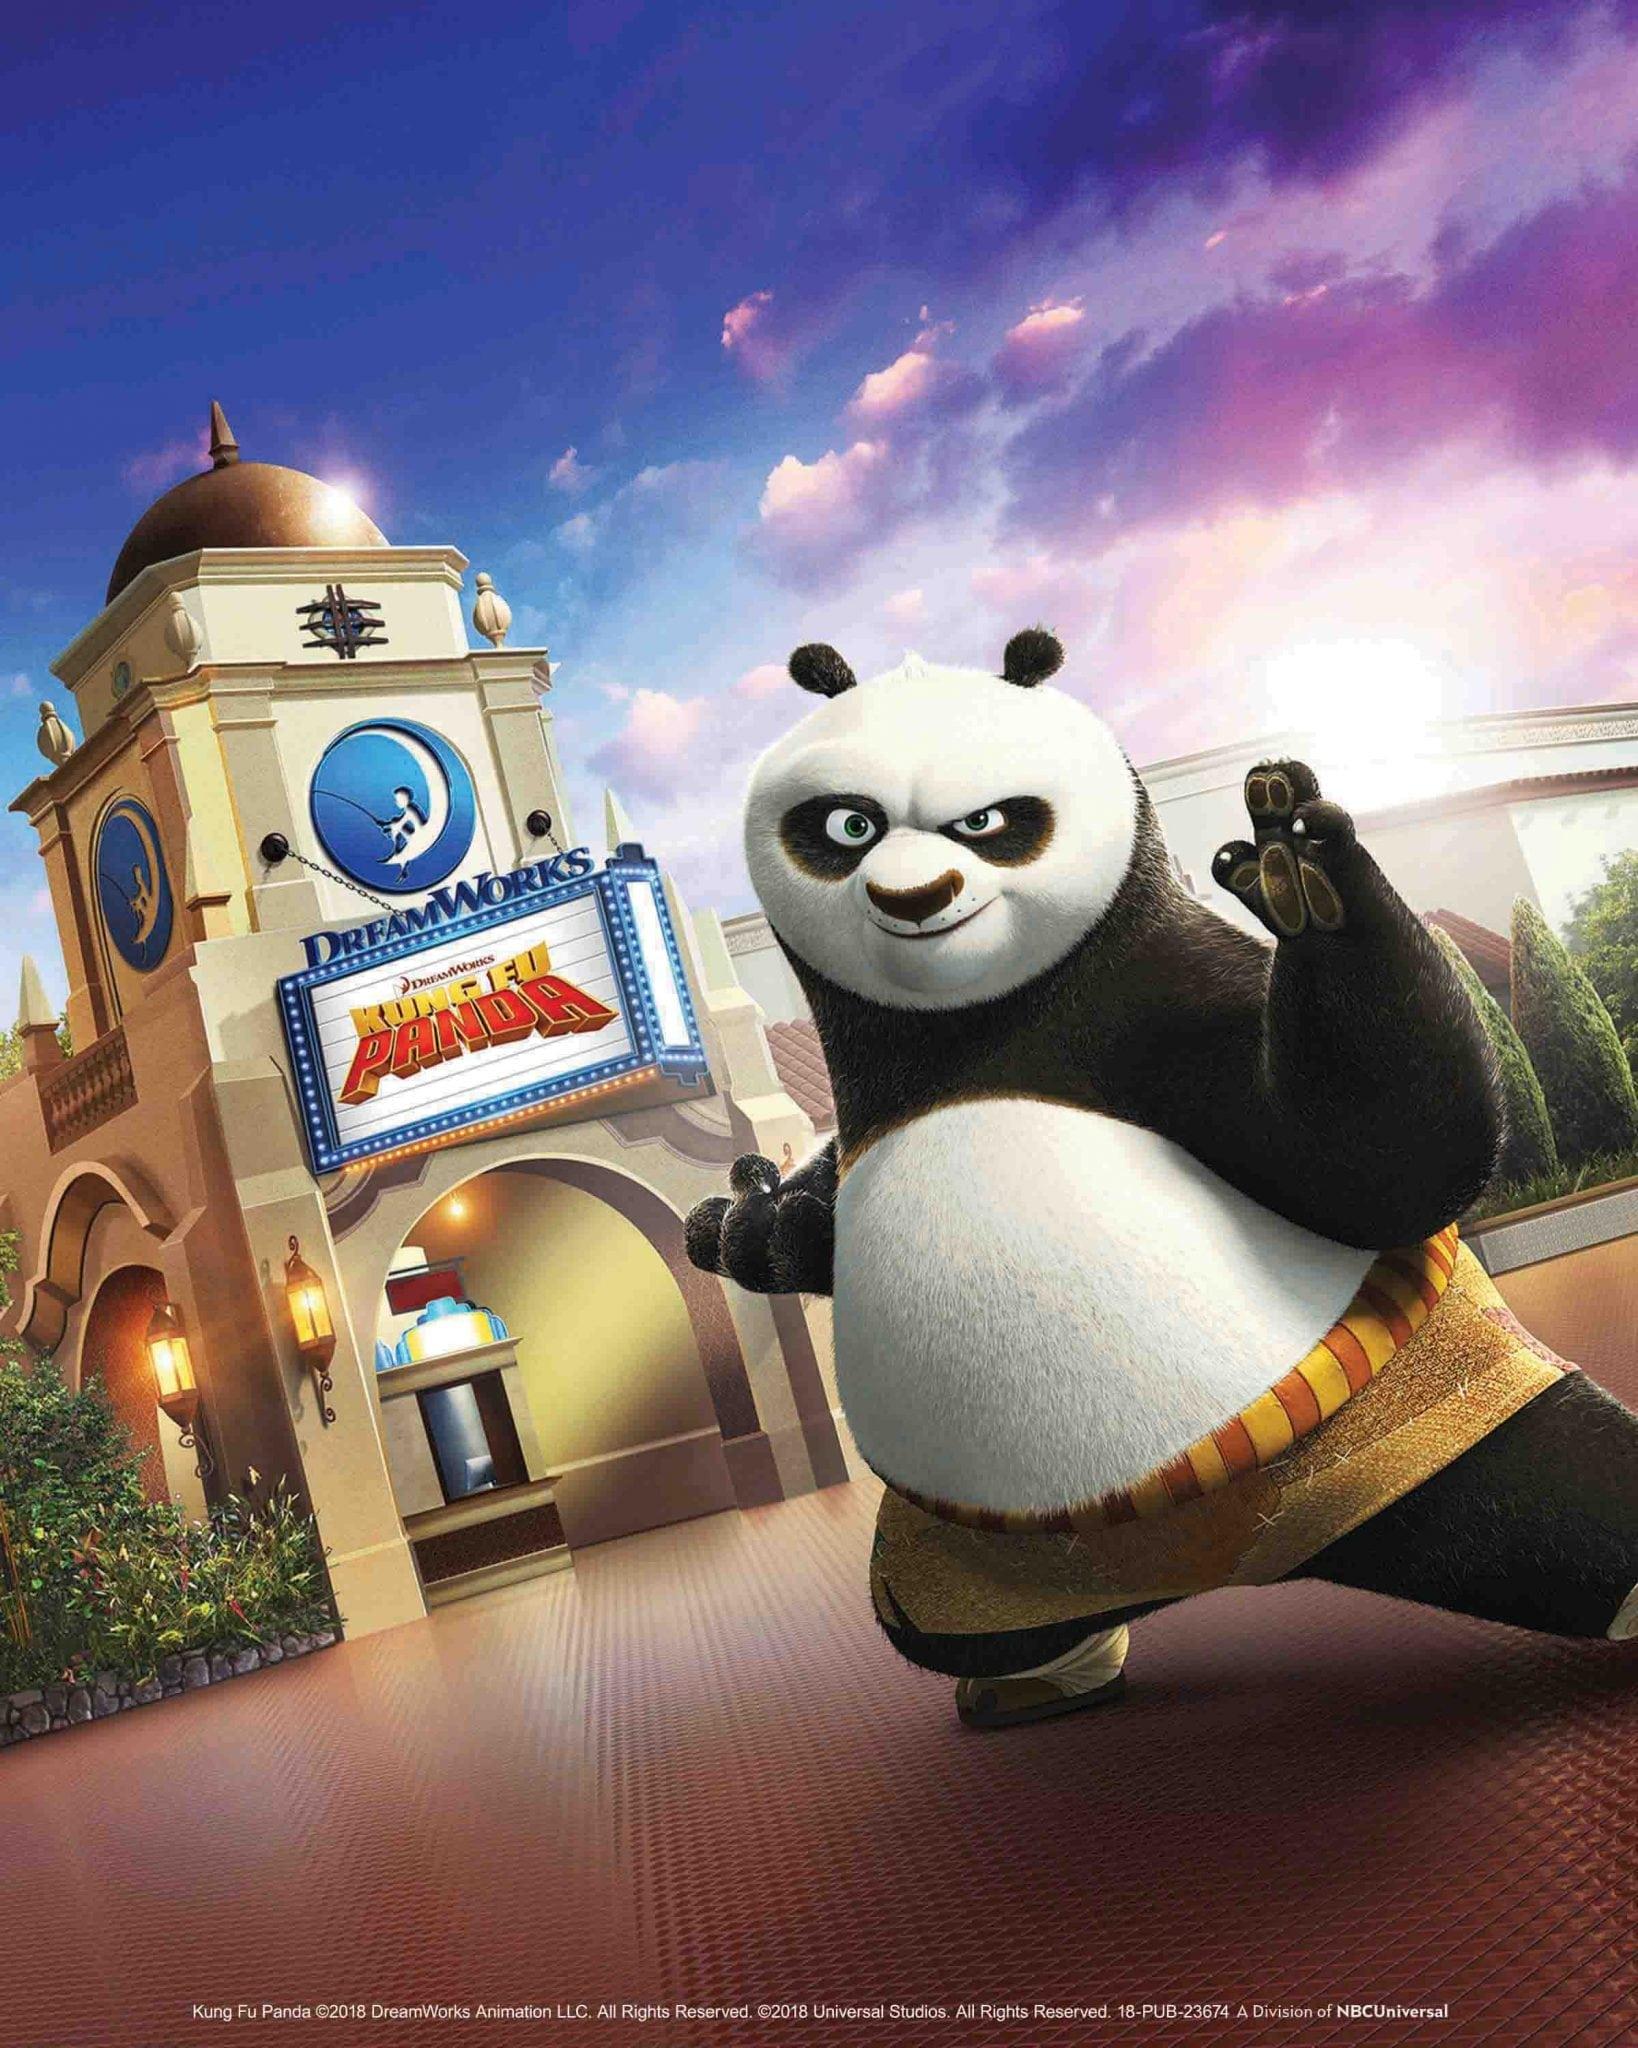 Kung Fu Panda: The Emperor's Quest Premiere